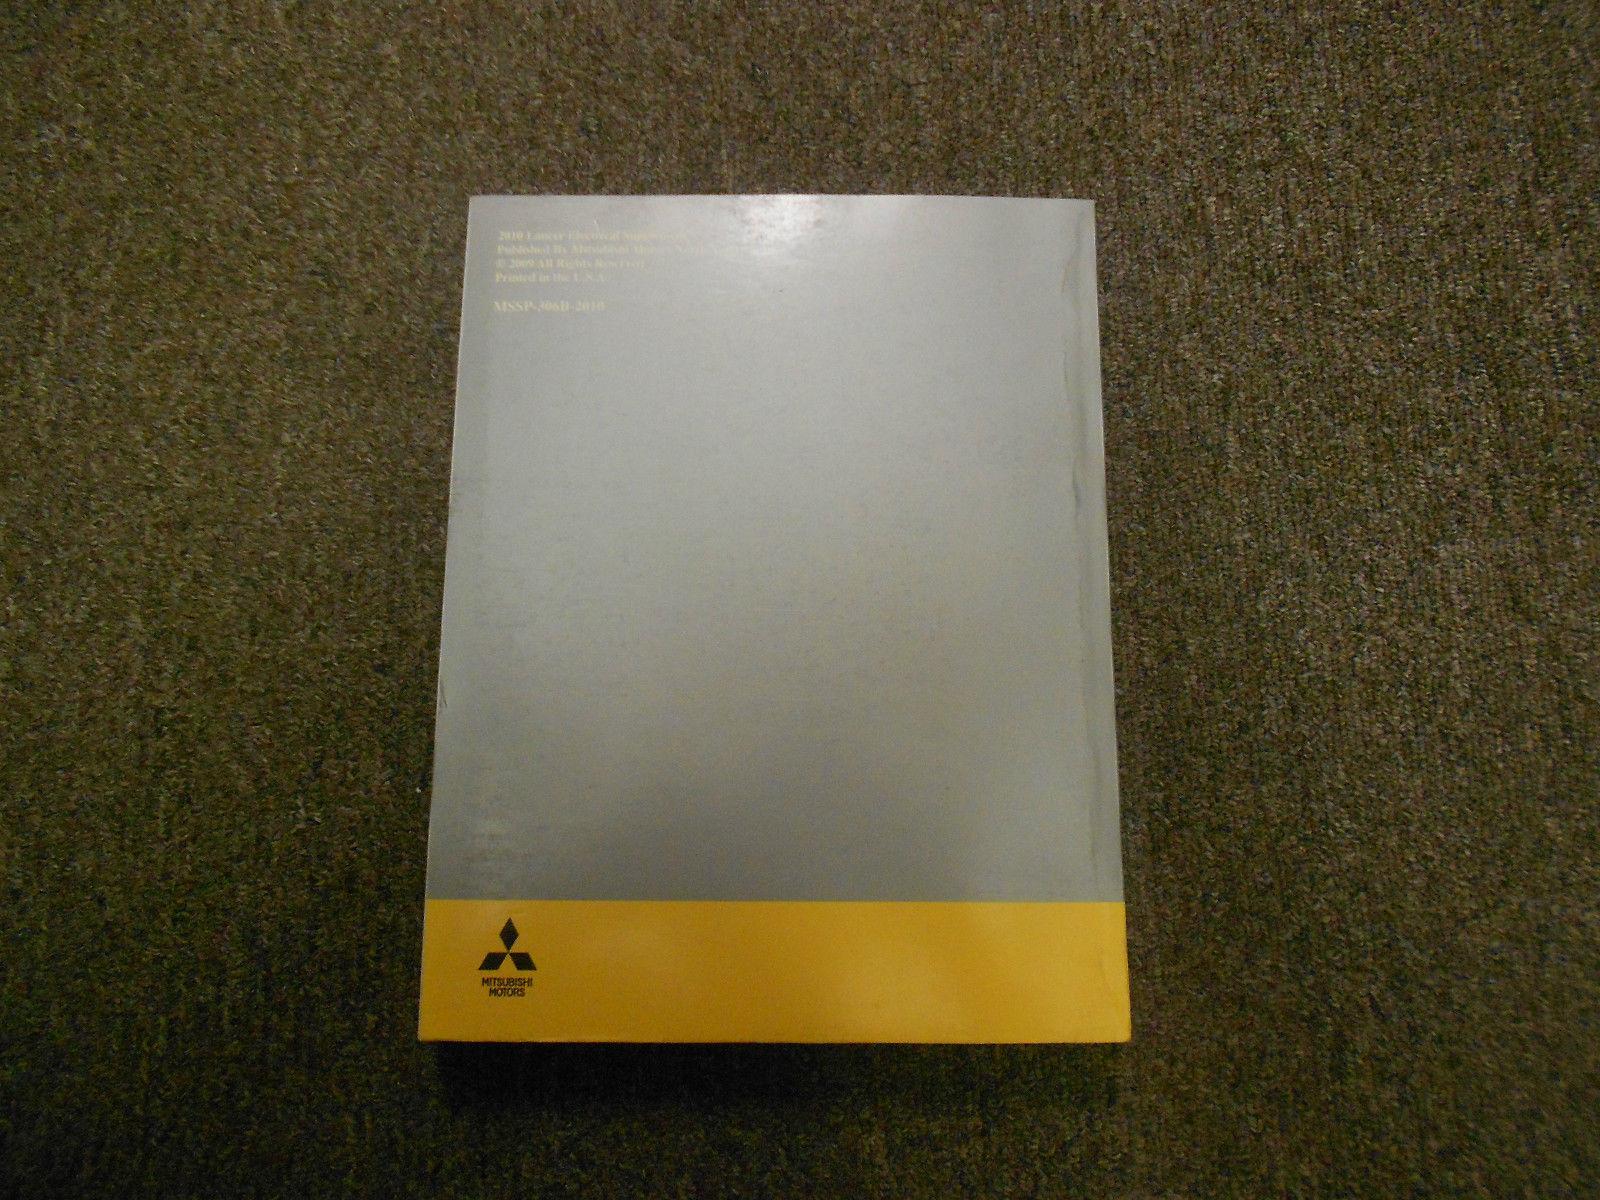 2010 MITSUBISHI Lancer Electrical Supplement Service Repair Manual FACTORY OEM